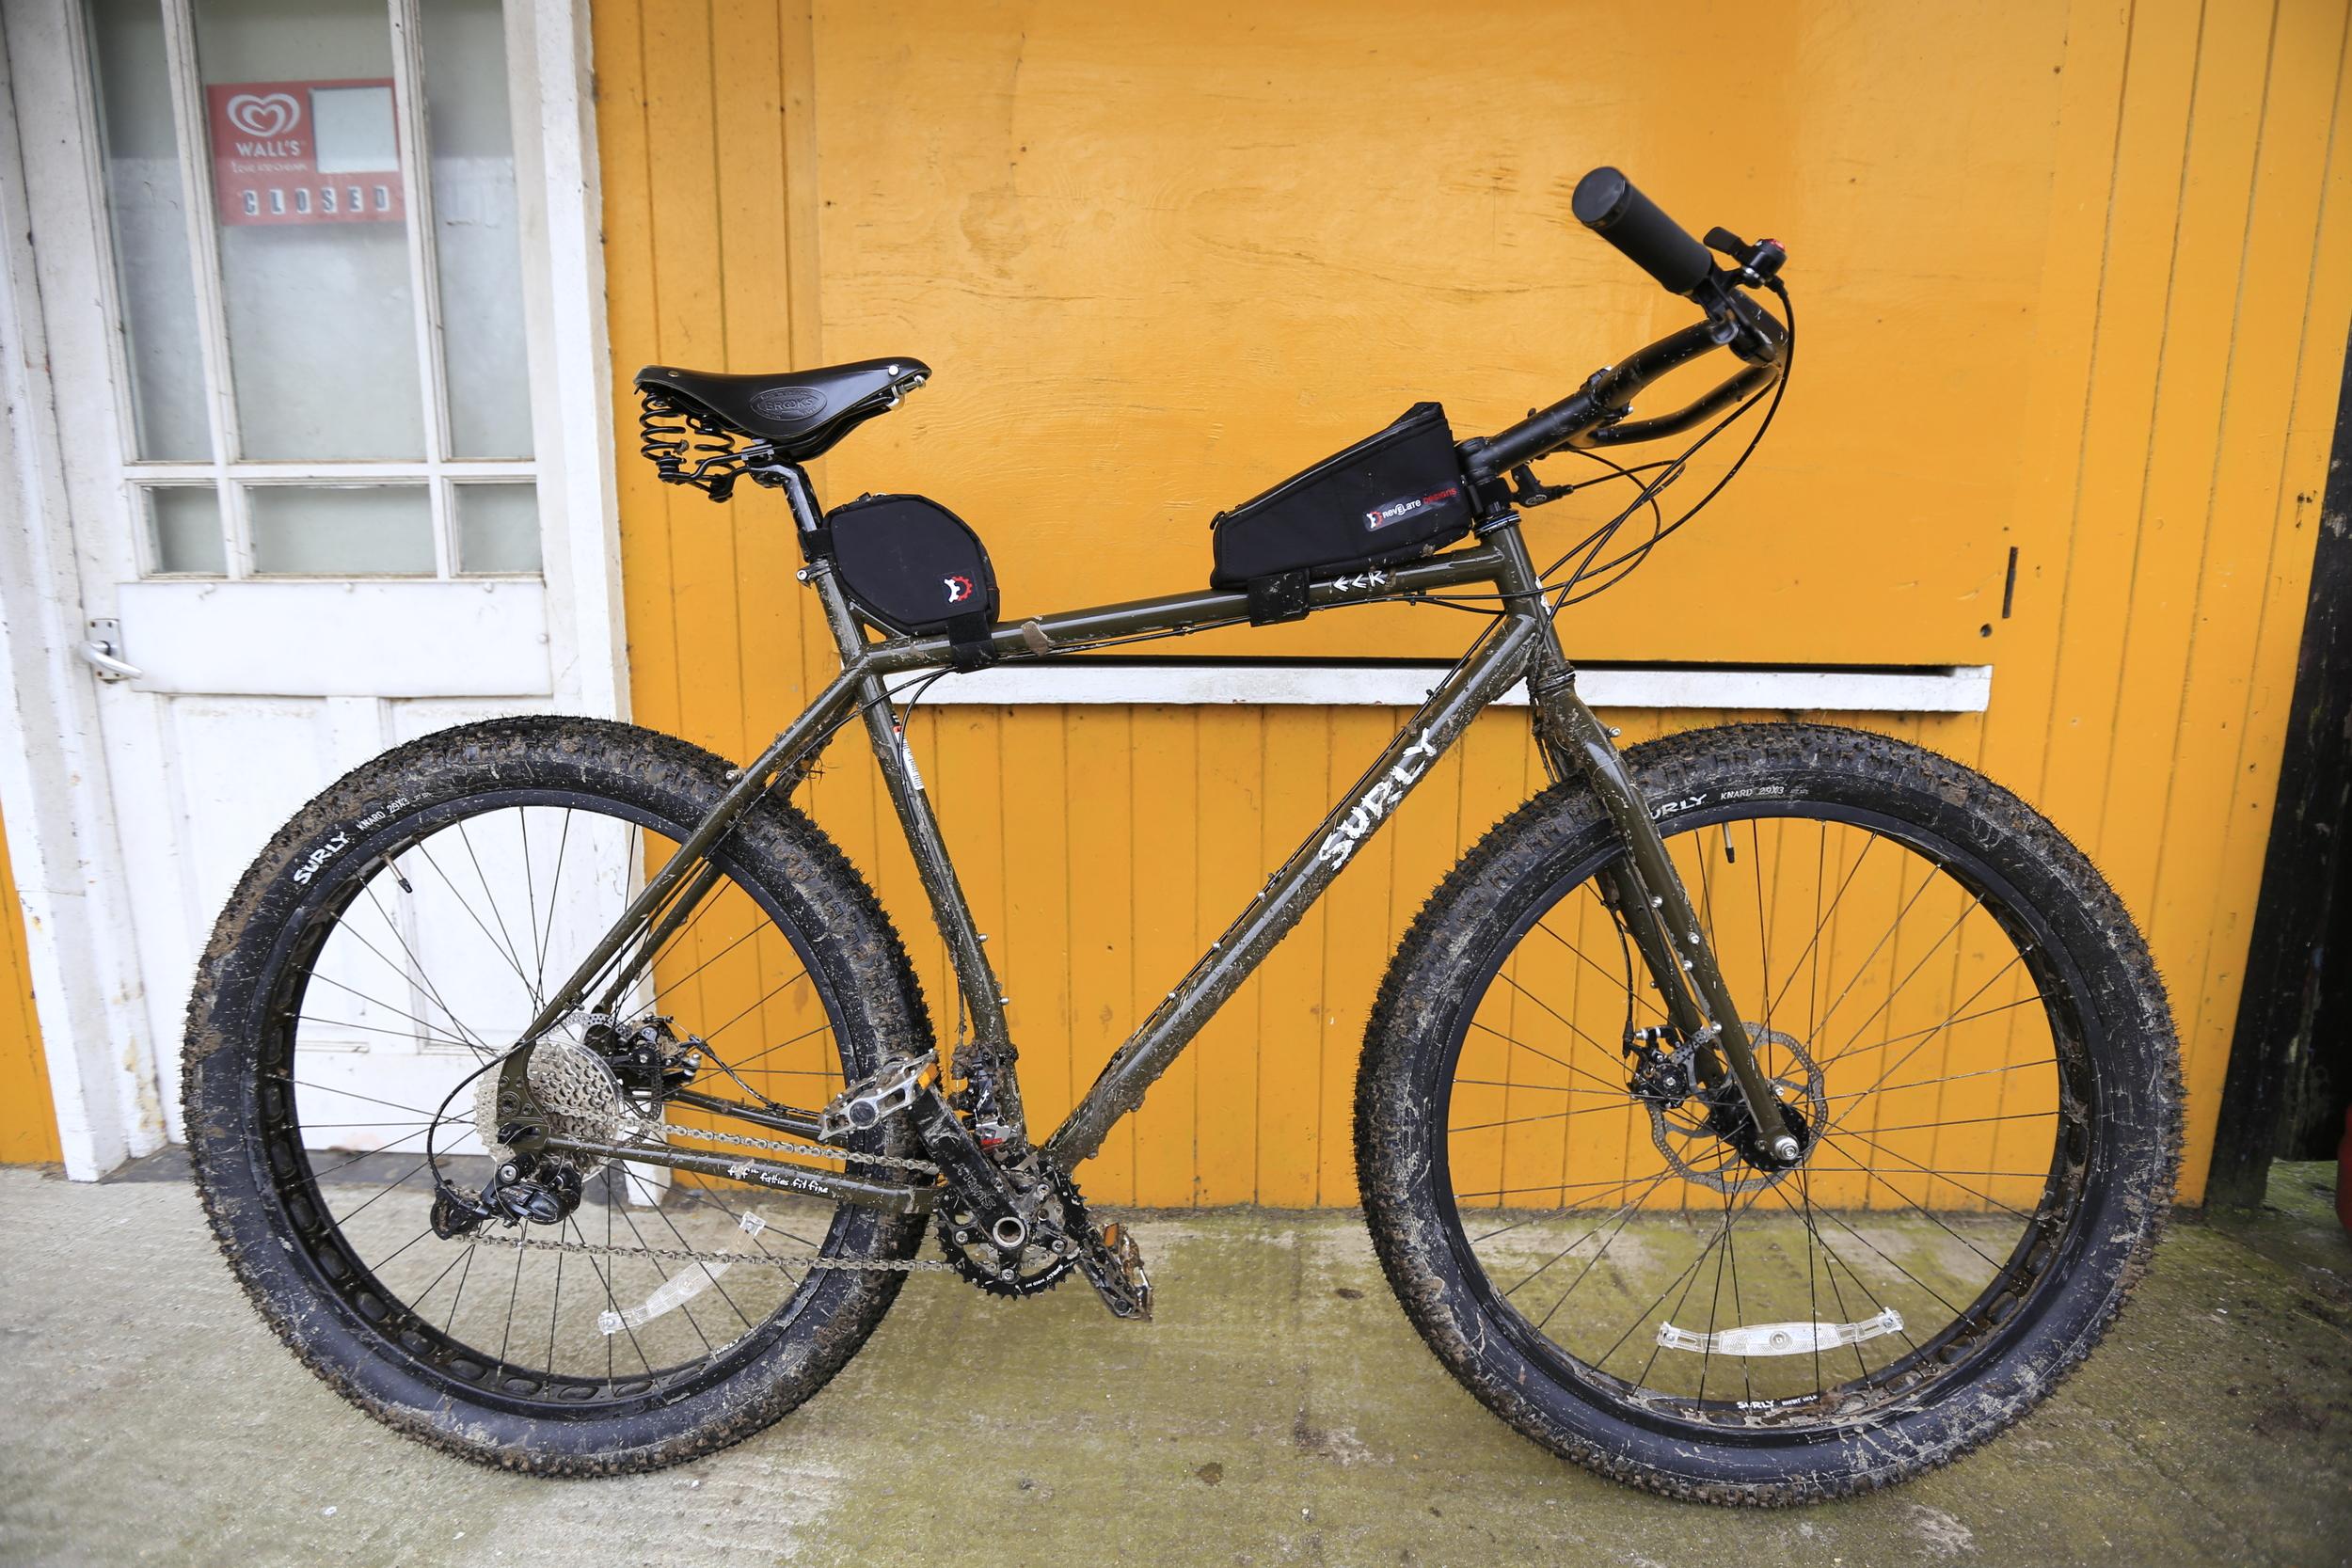 brooks flyer, brooks b17, surly, surly ecr, bicycle touring apocalypse, bicycletouringapocalypse.com, bicycle touring, cycle touring, bikepacking, fat bike, revelate designs